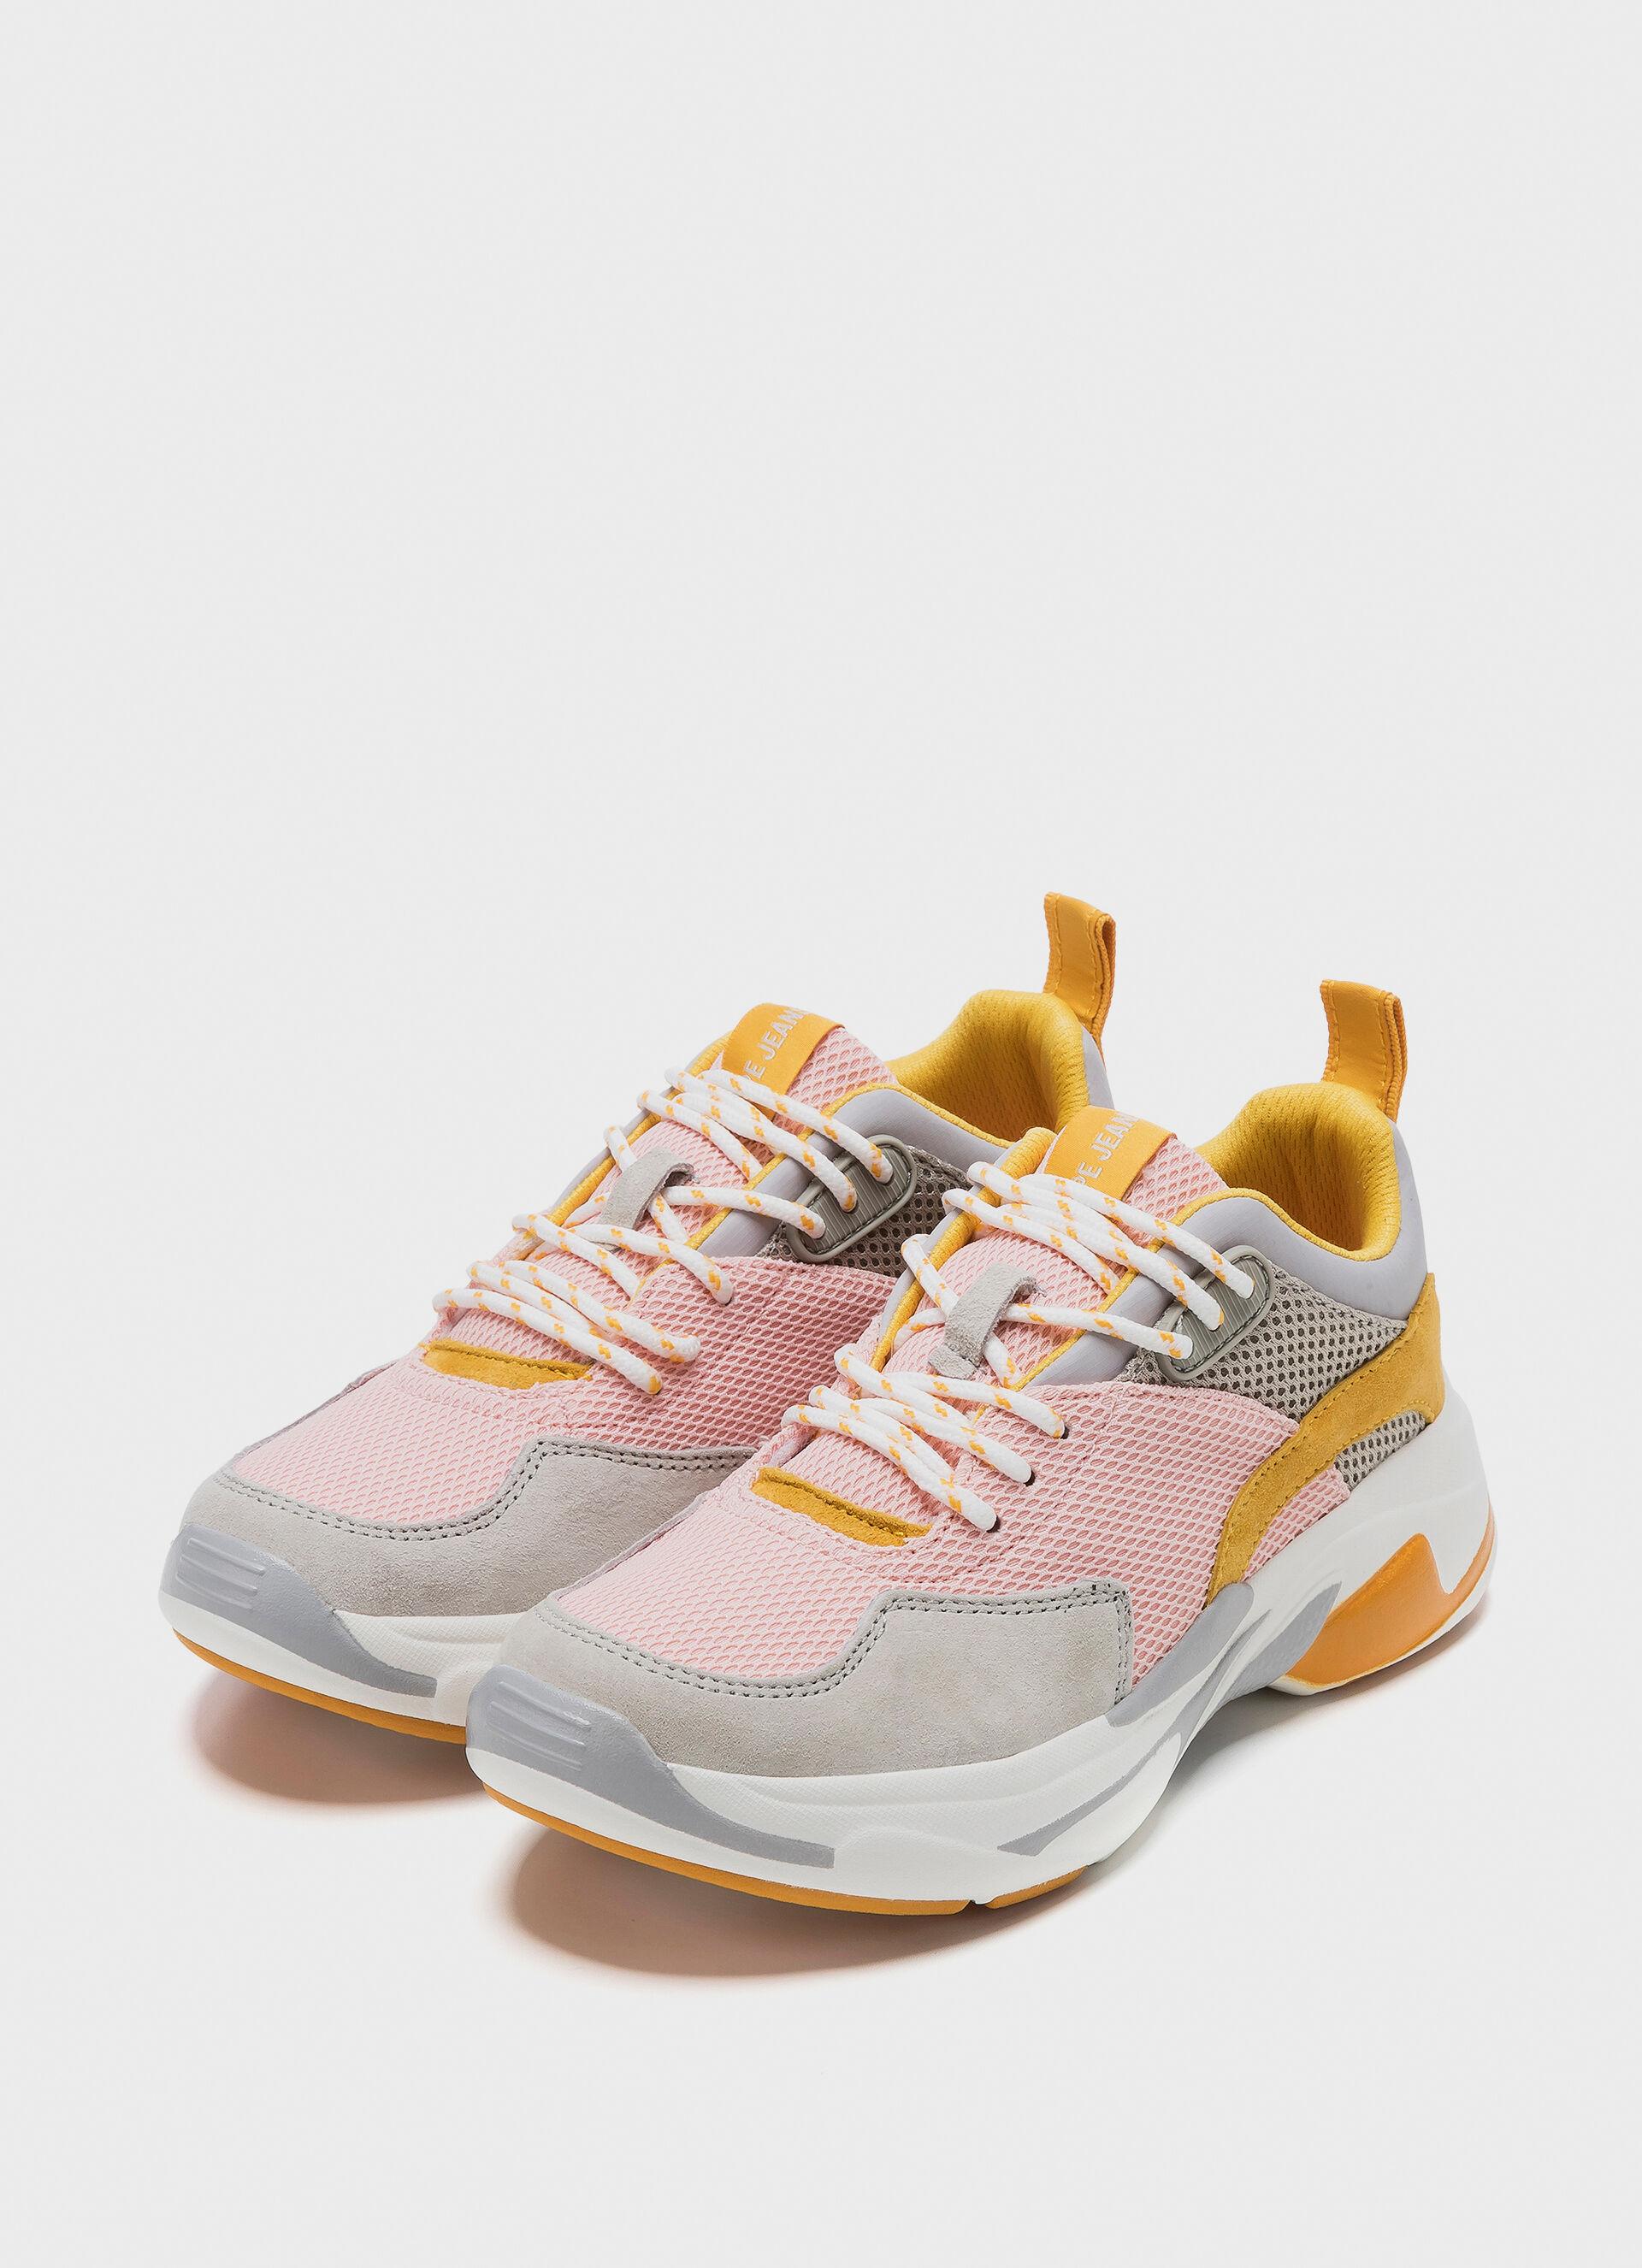 Sneakers Colors Sinyu Maxi Sole FreshWomen CxeWdBoQrE